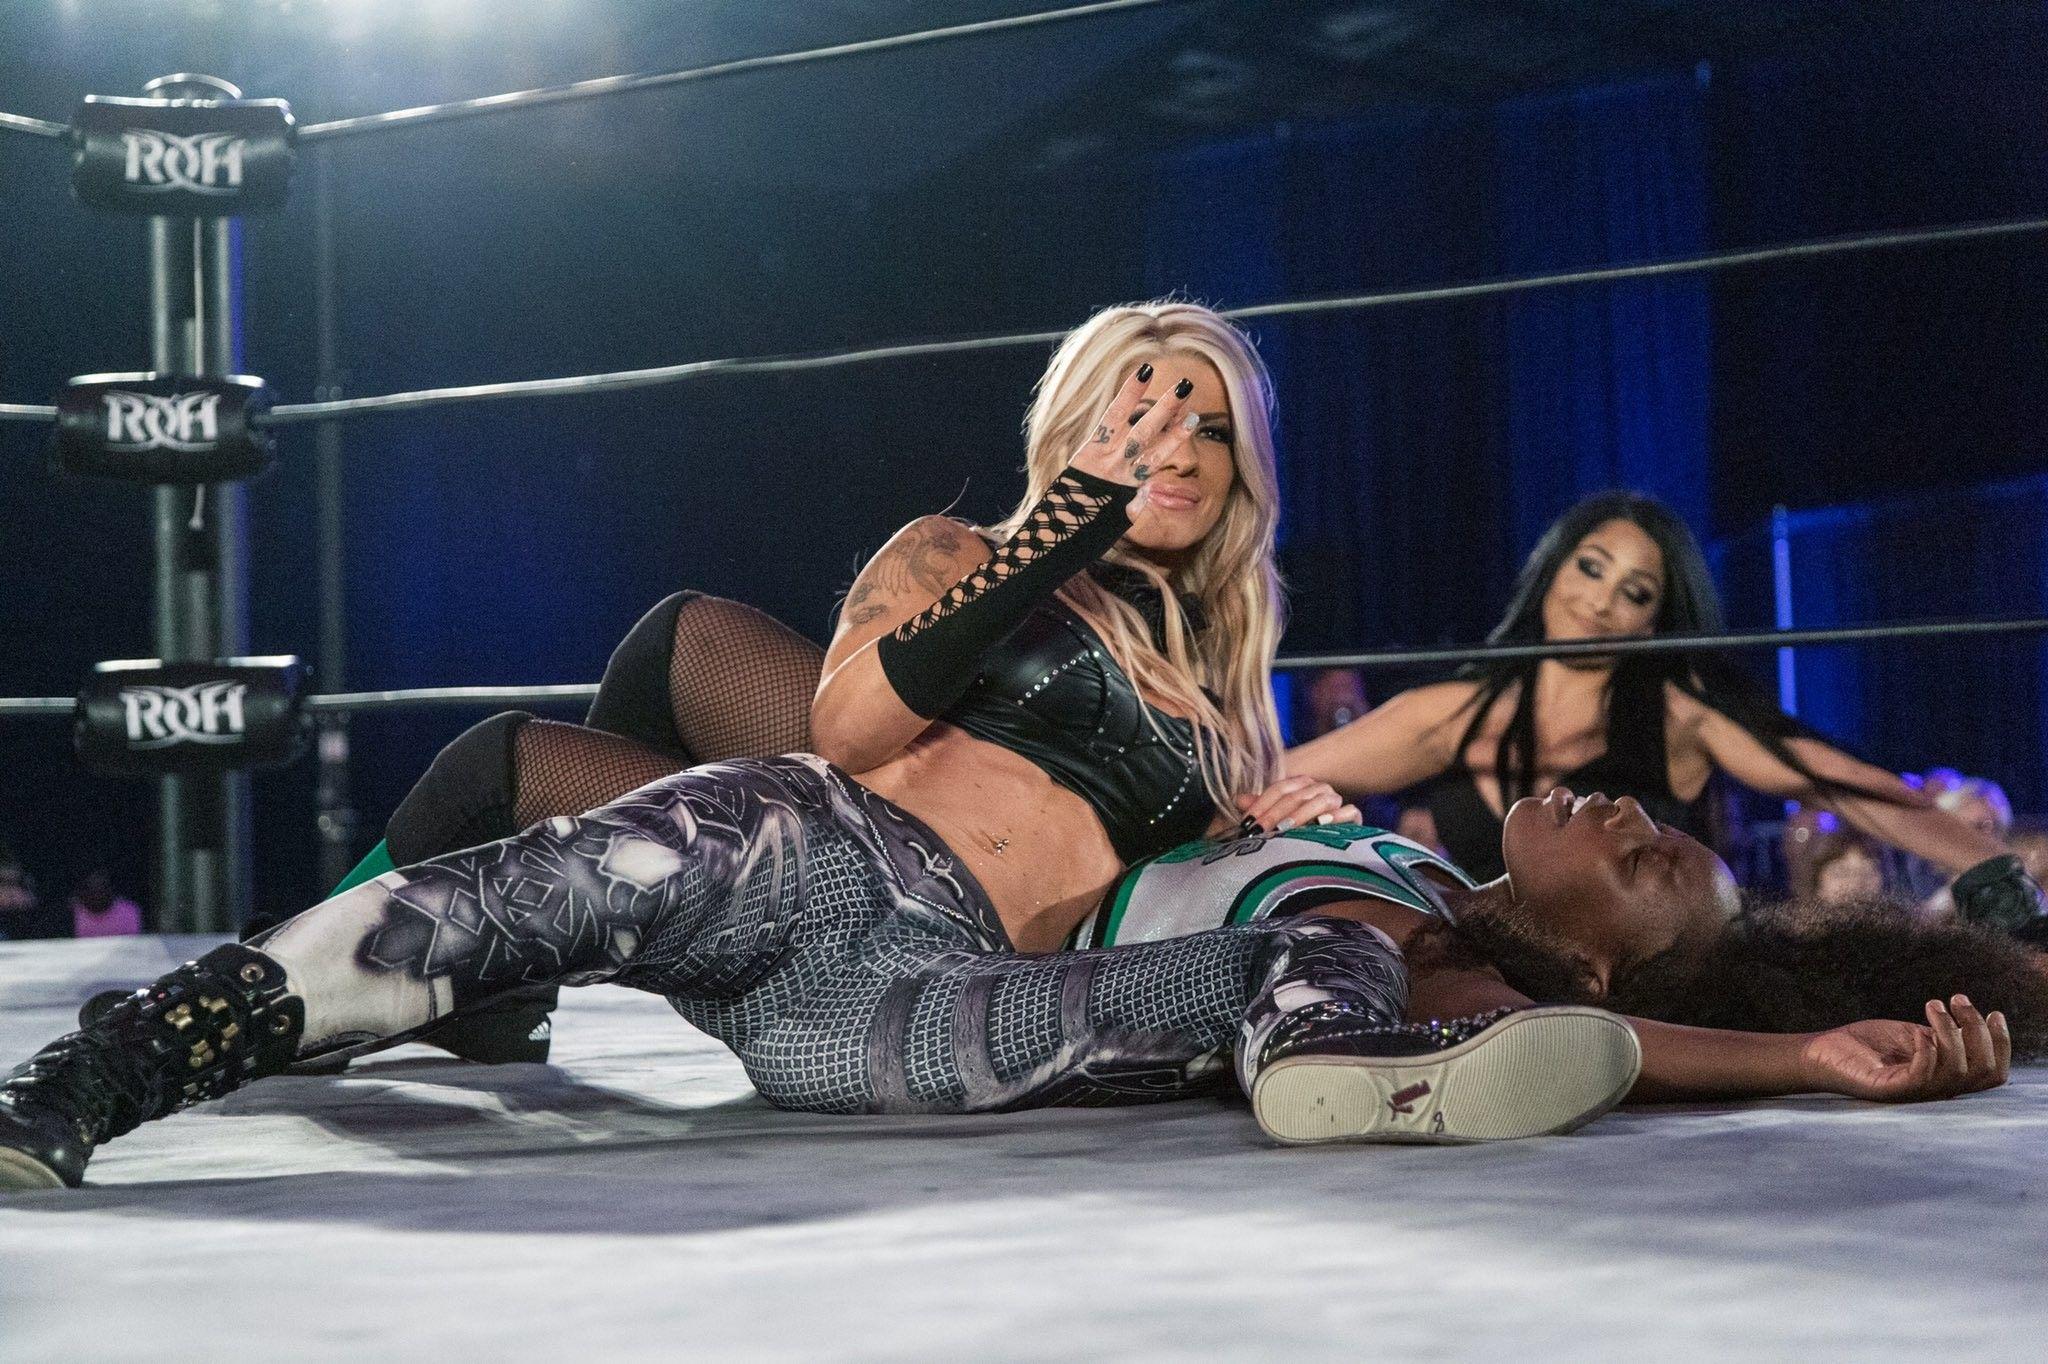 Pin on WWE Divas ↬★ˎˊ-⌇